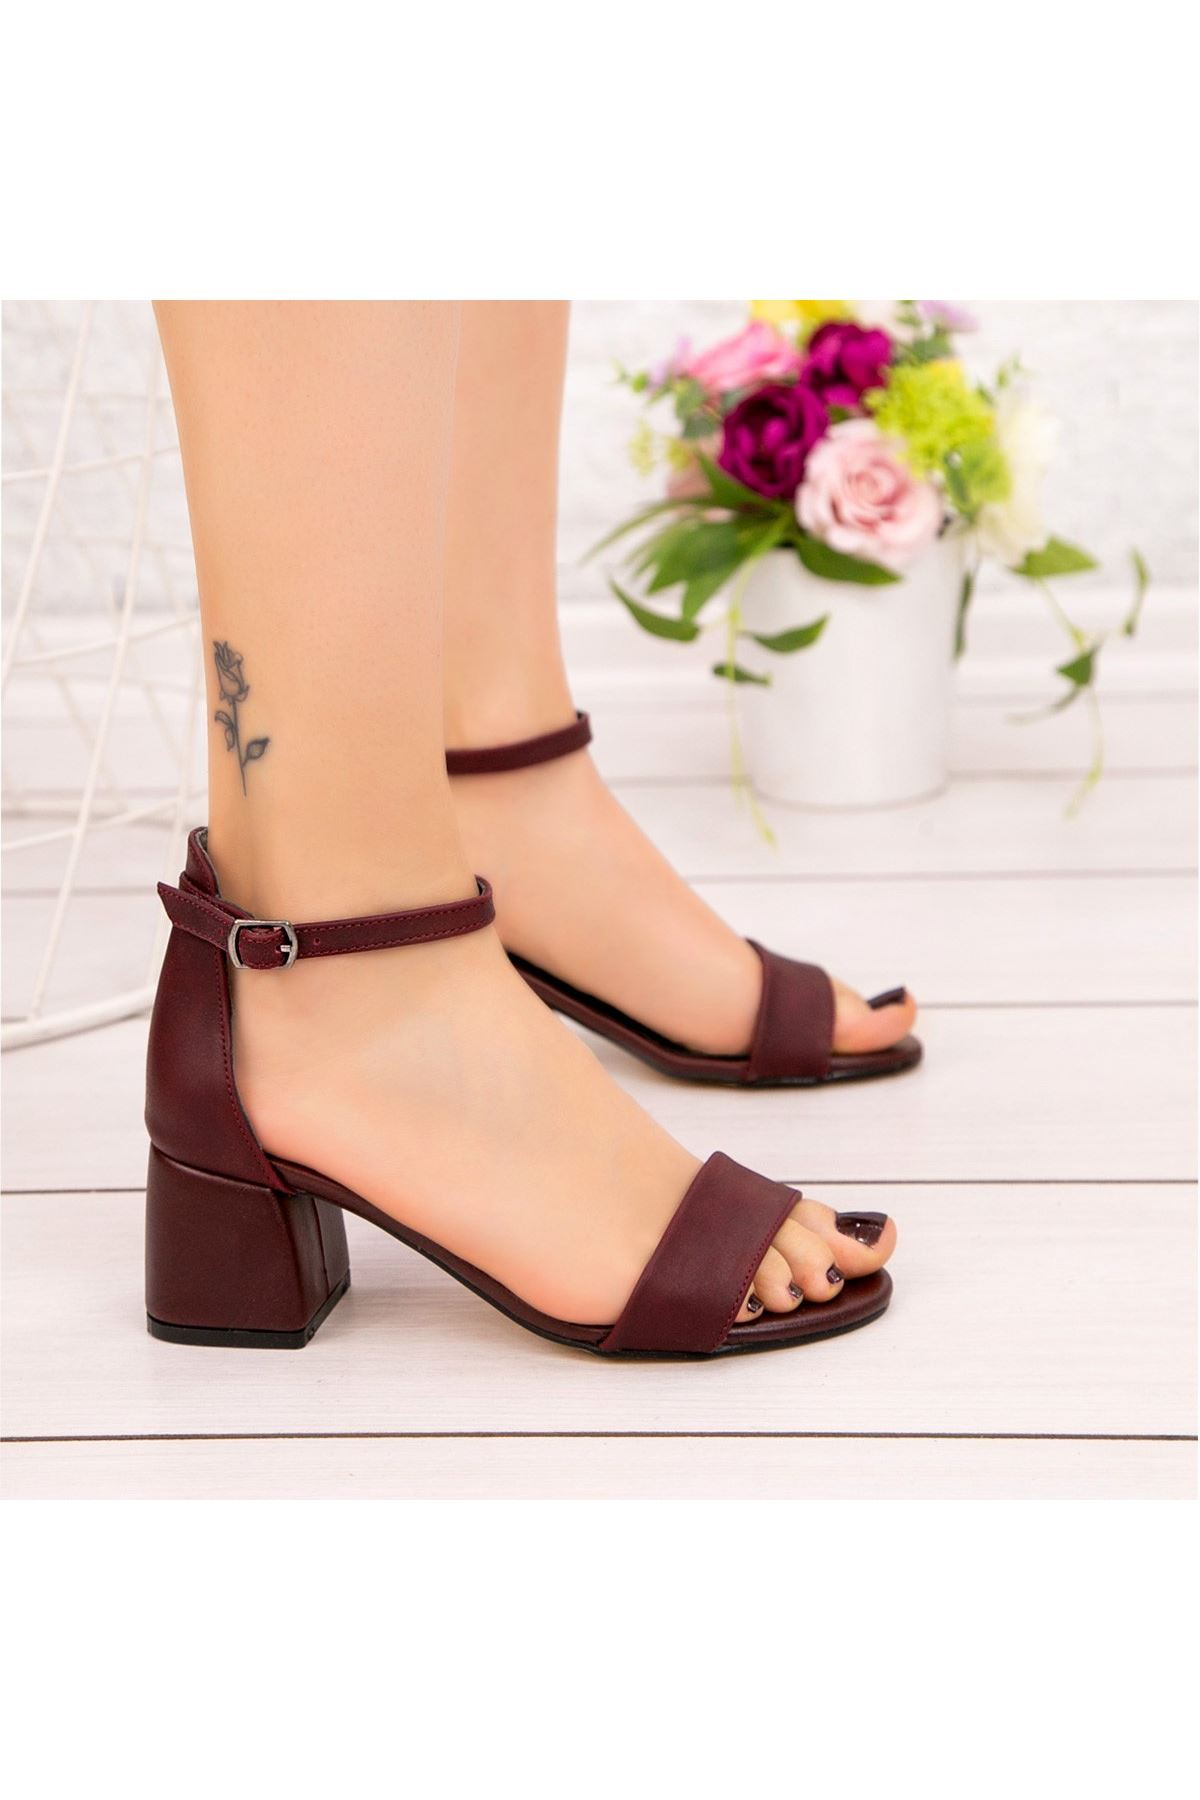 Epon Bordo Cilt Tek Bant Topuklu Ayakkabı